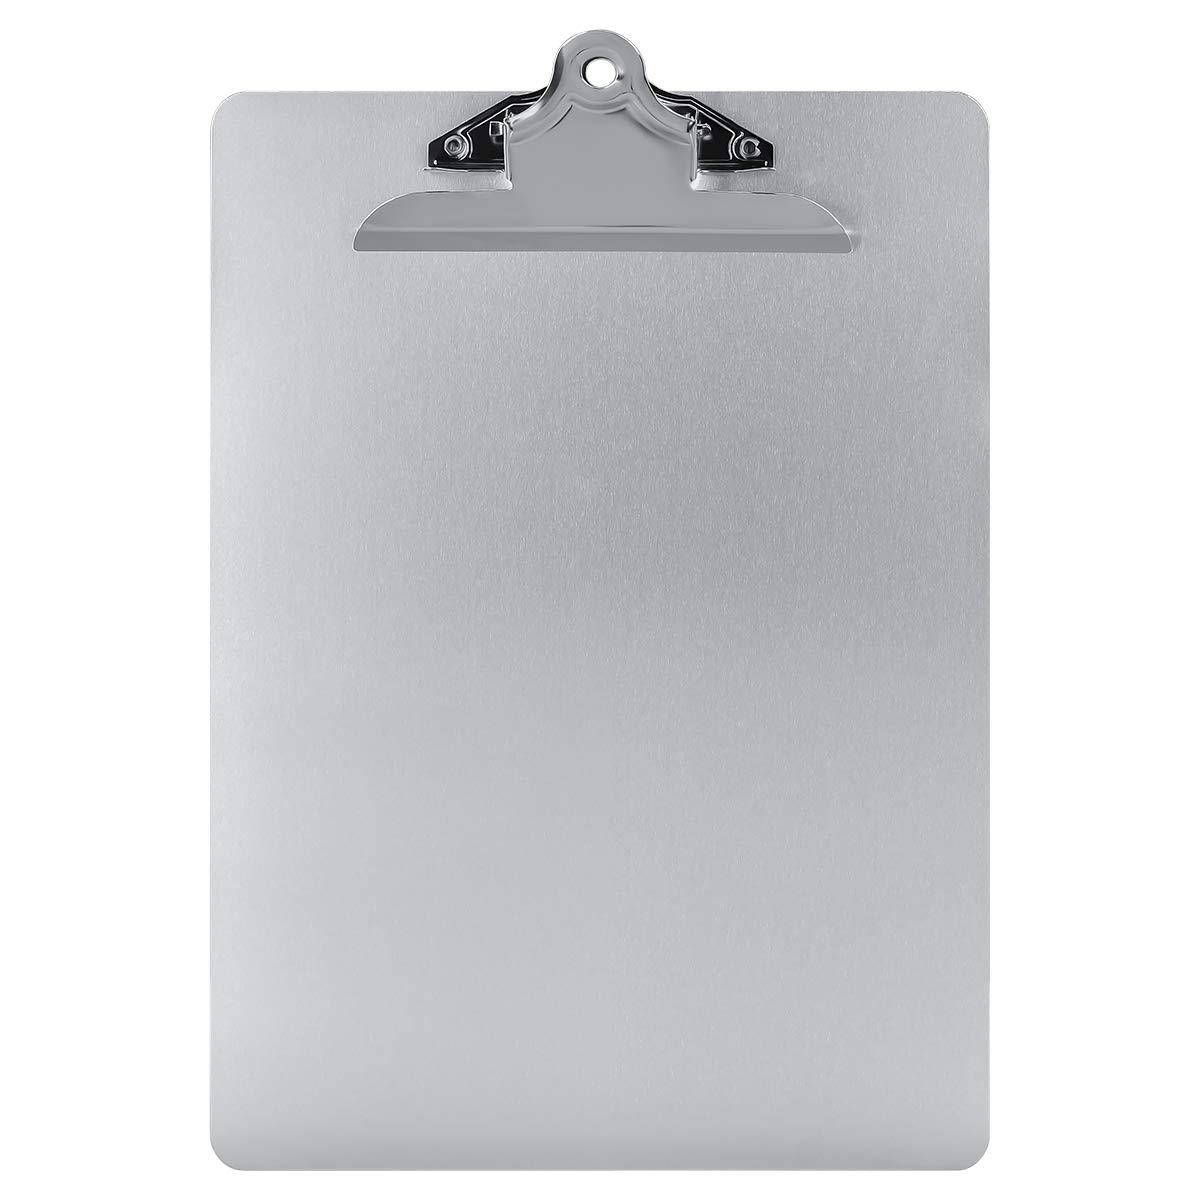 Aluminum Clipboard Paper Holder Steel Metal Clipboard - 9x12.5 Letter Size, File A4 Binder Holder for Office School Worker Business SUNNYCLIP